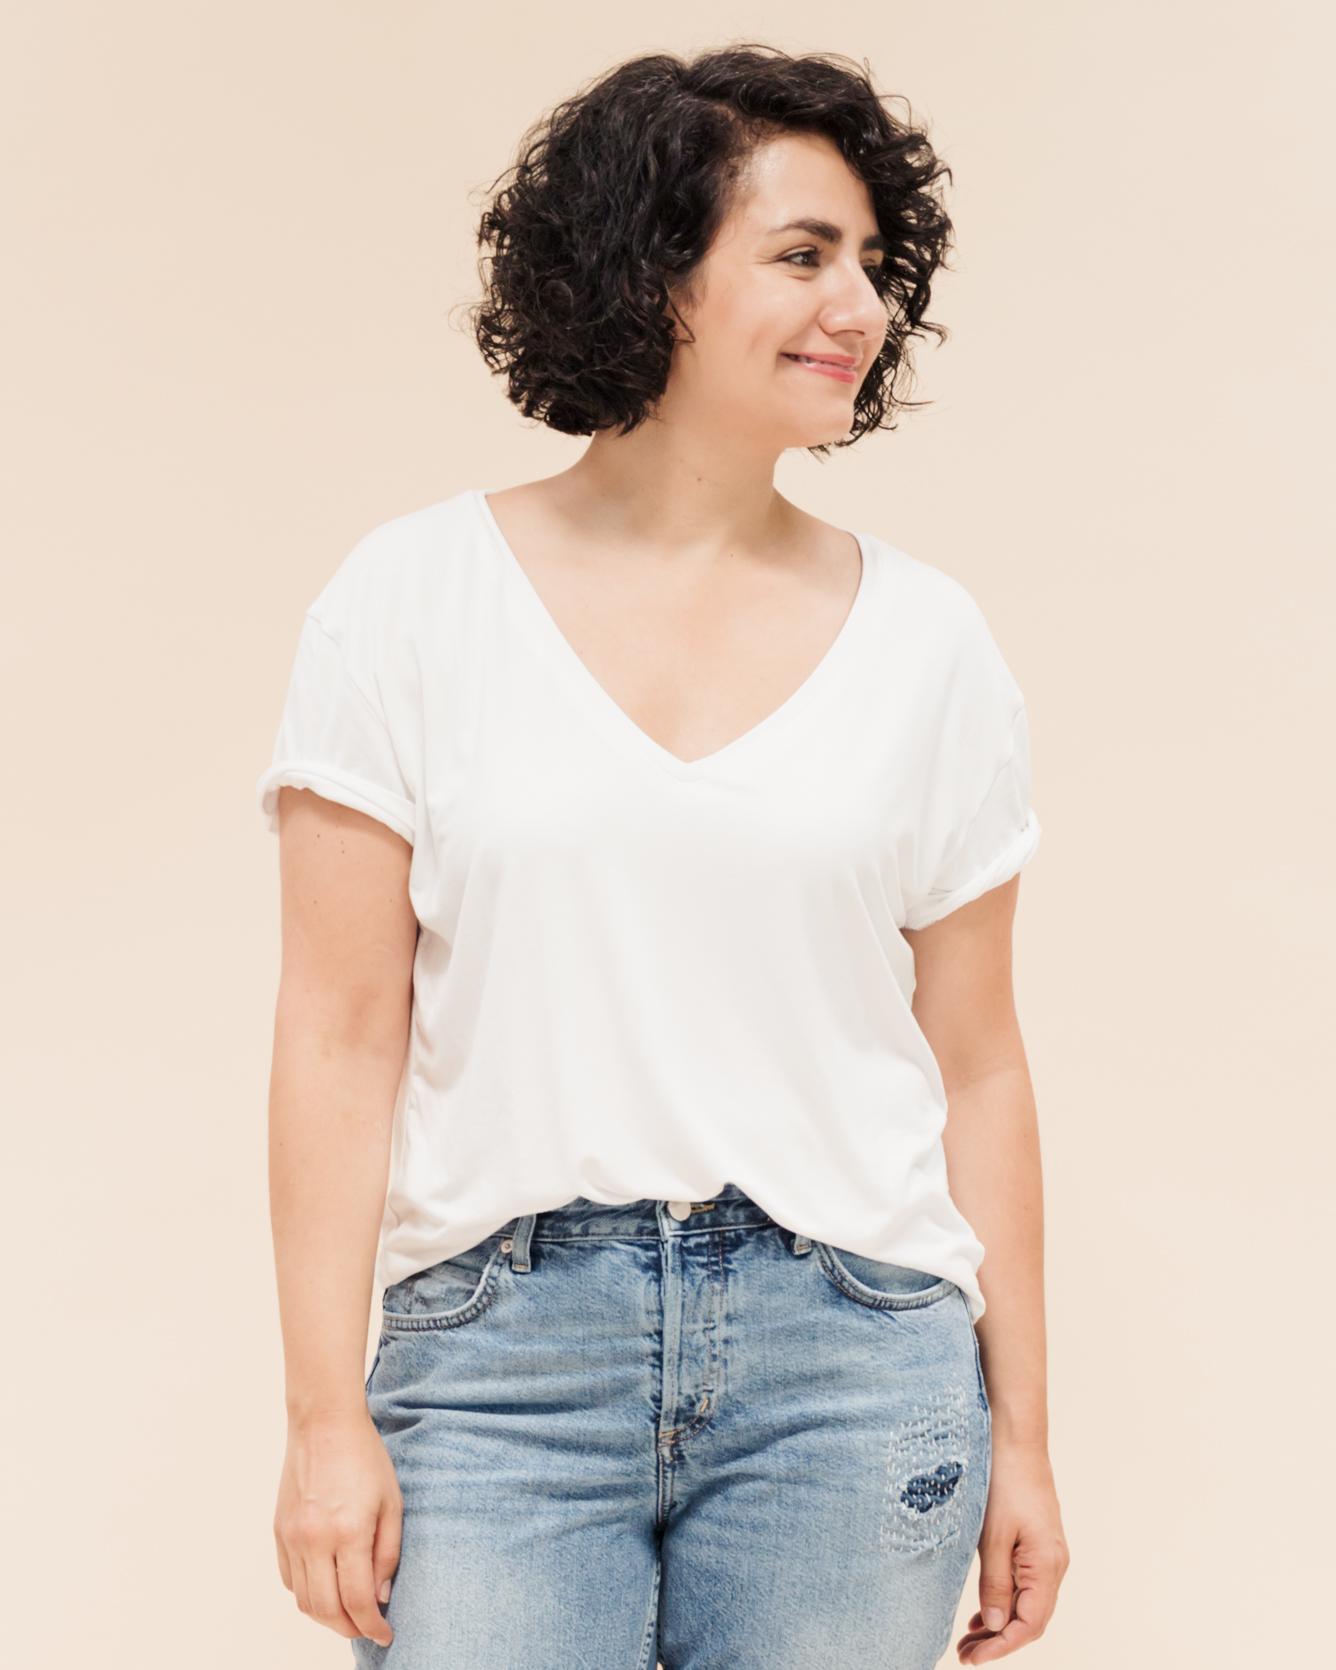 Schnittmuster T-Shirt mit V-Ausschnitt nähen - Schnittduett